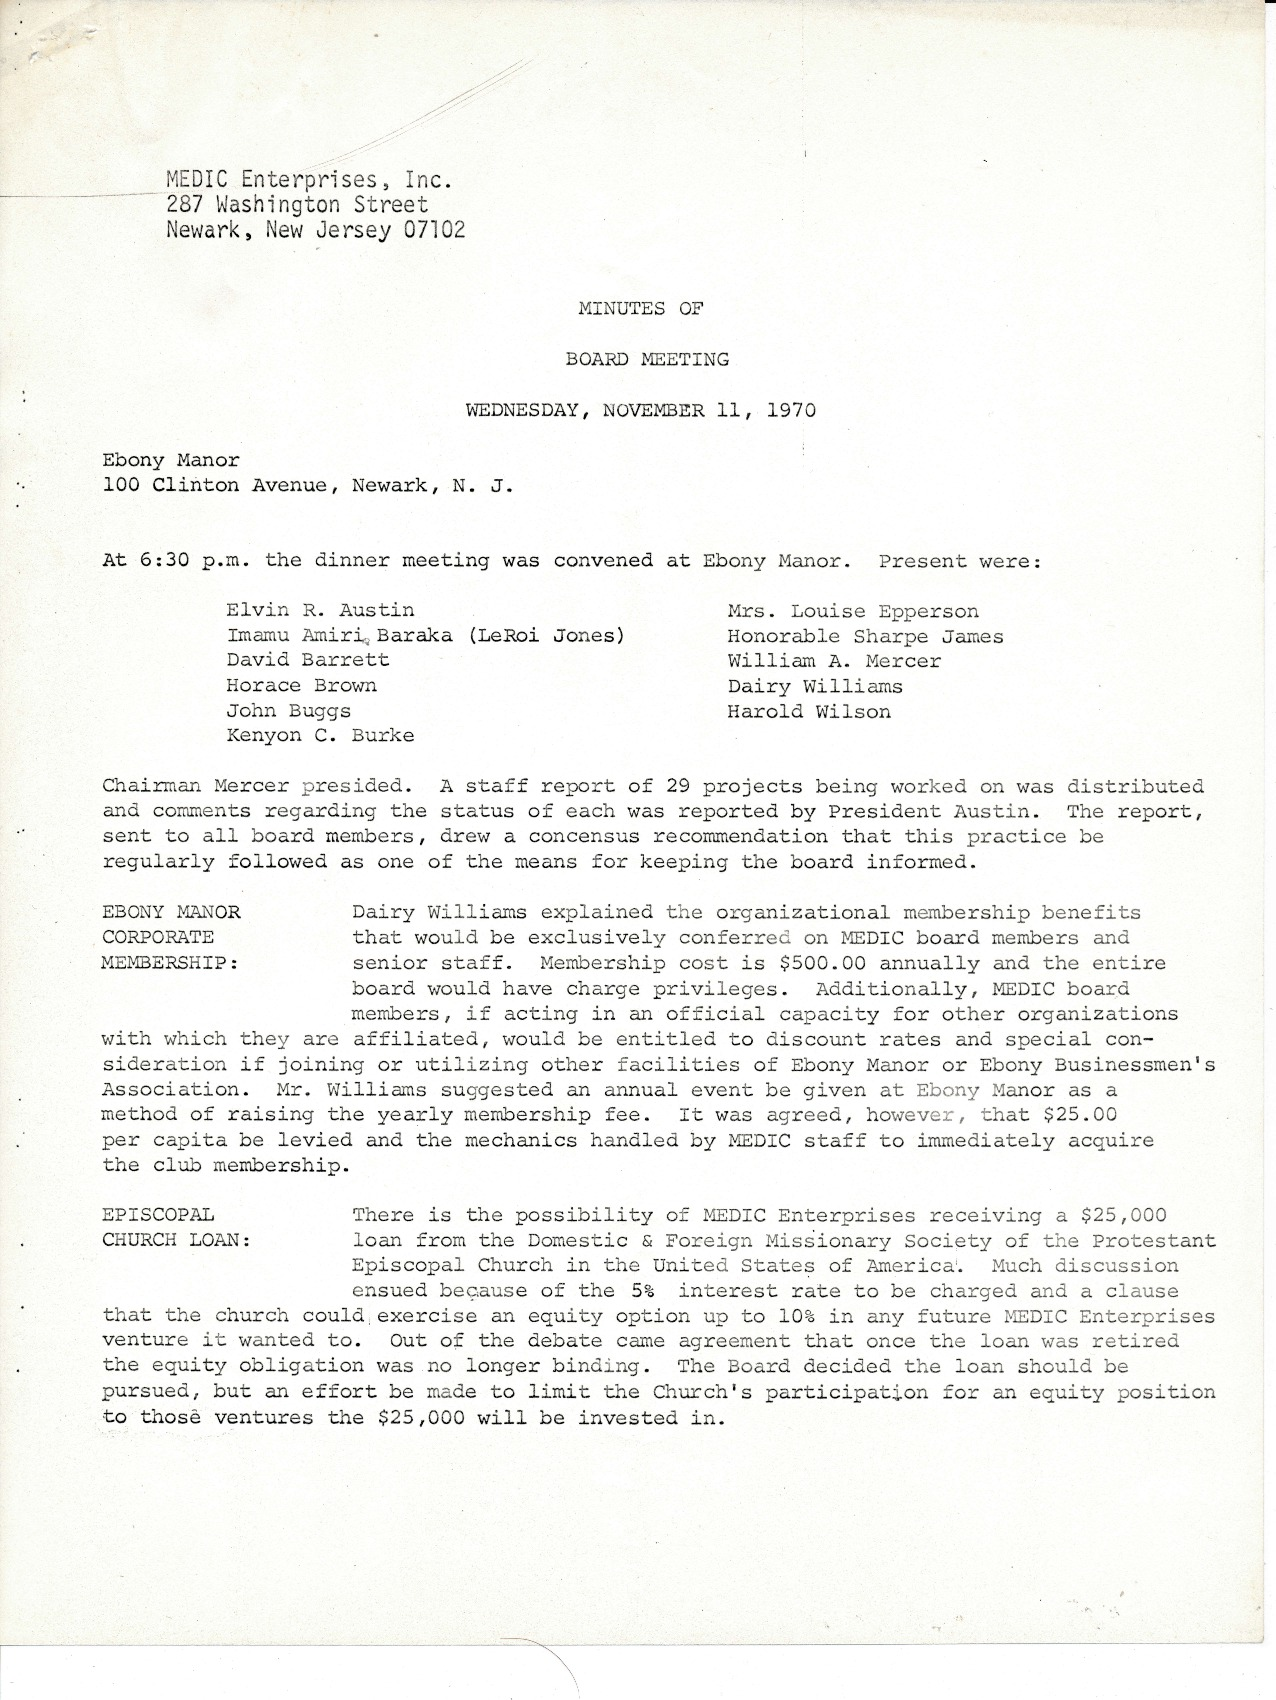 MEDIC Board Meeting Minutes (November 1970)